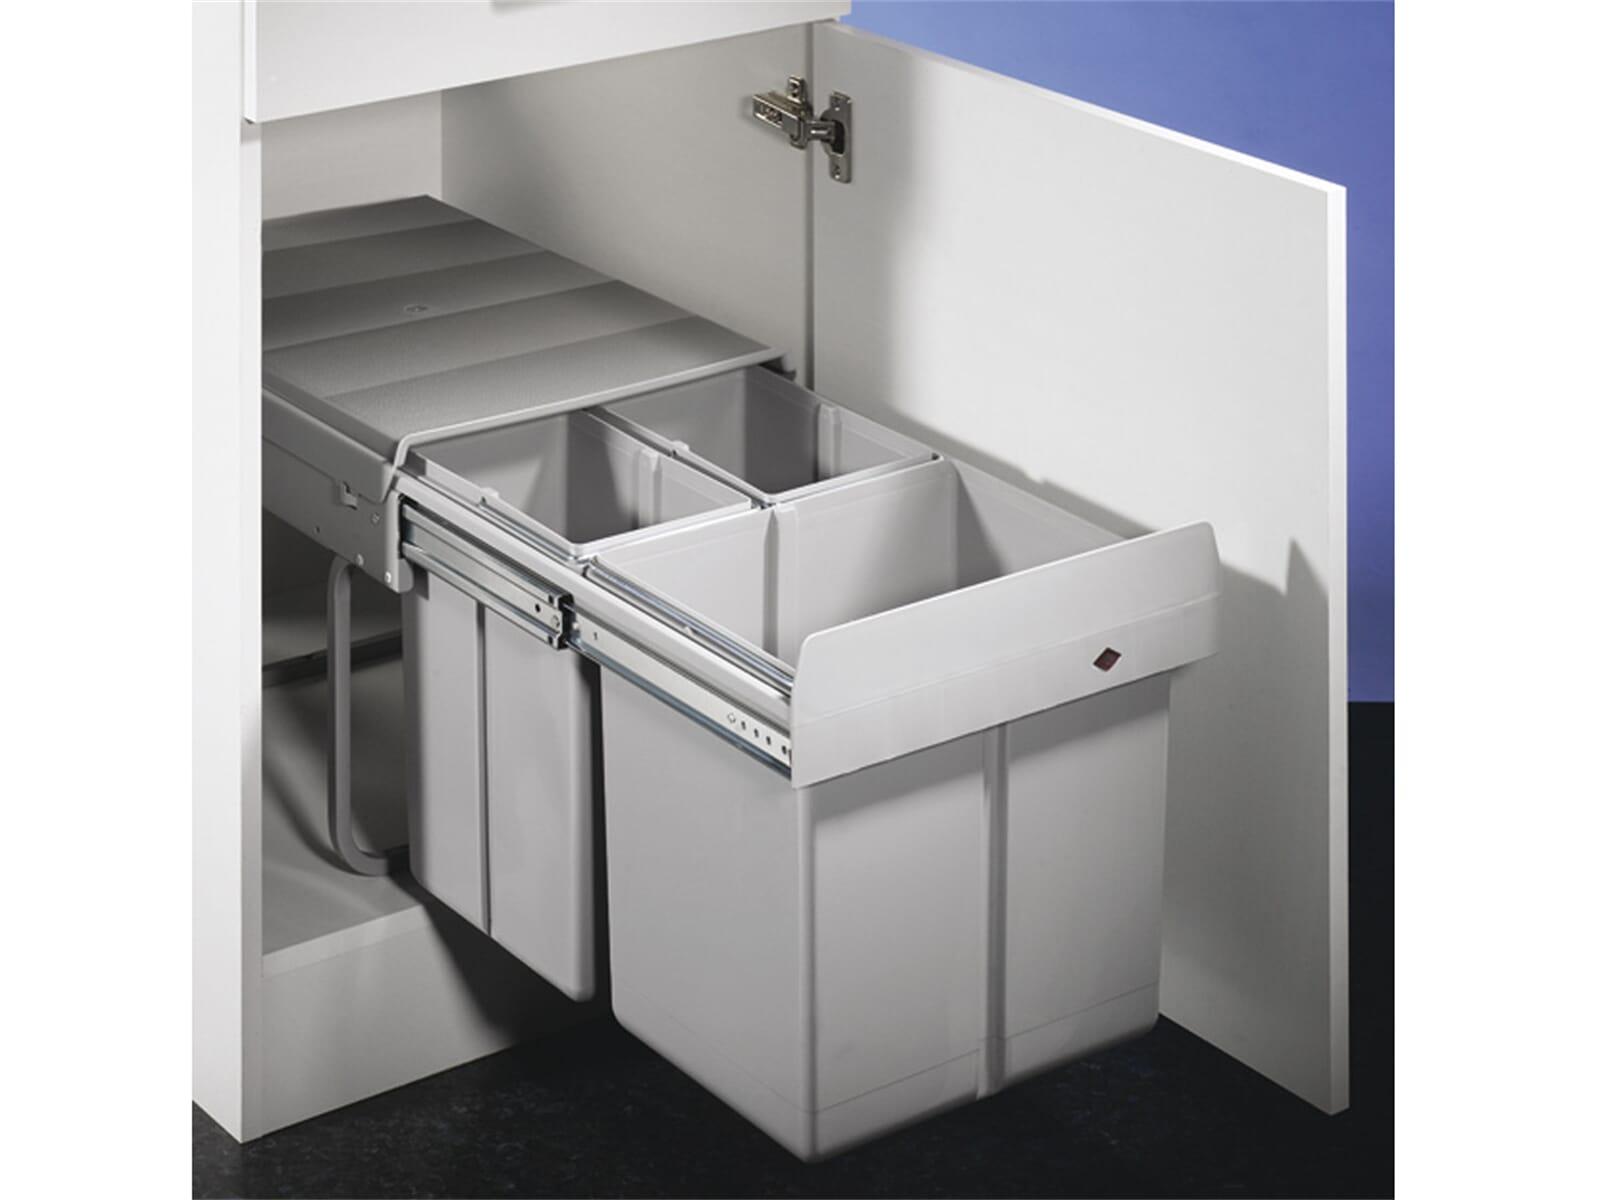 naber trenta 6 einbau abfallsammler. Black Bedroom Furniture Sets. Home Design Ideas